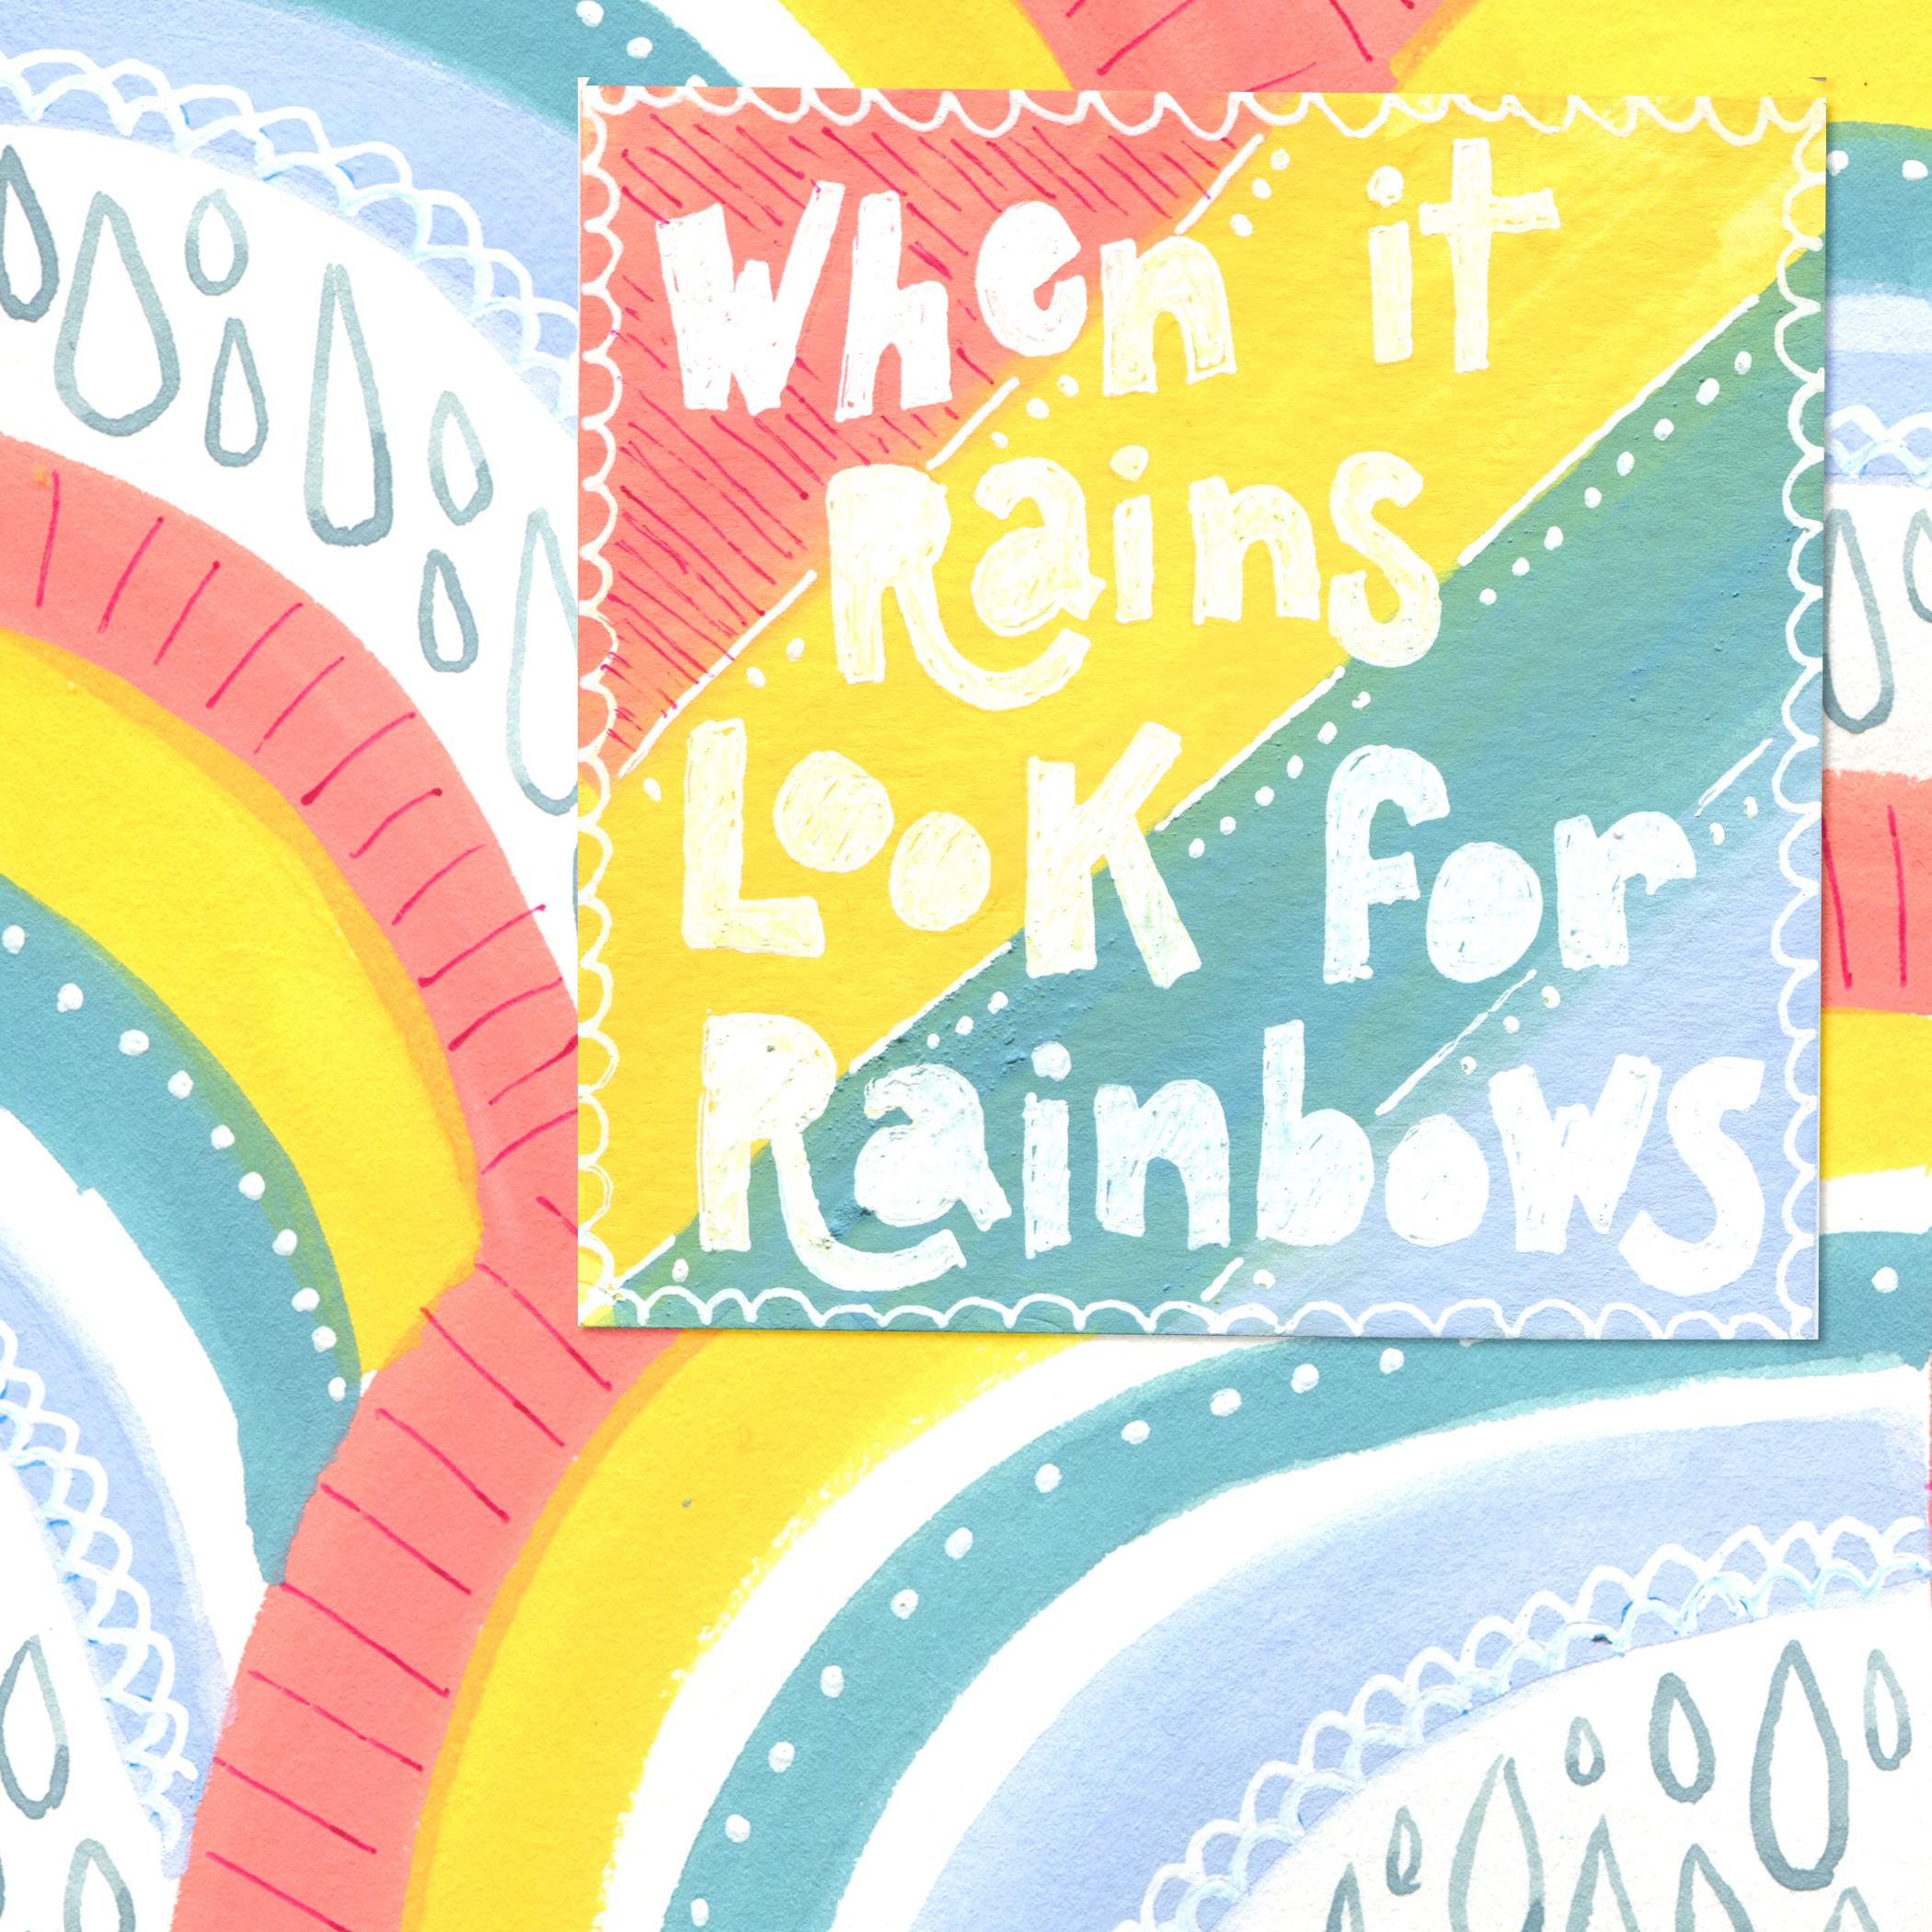 When-it-rains3